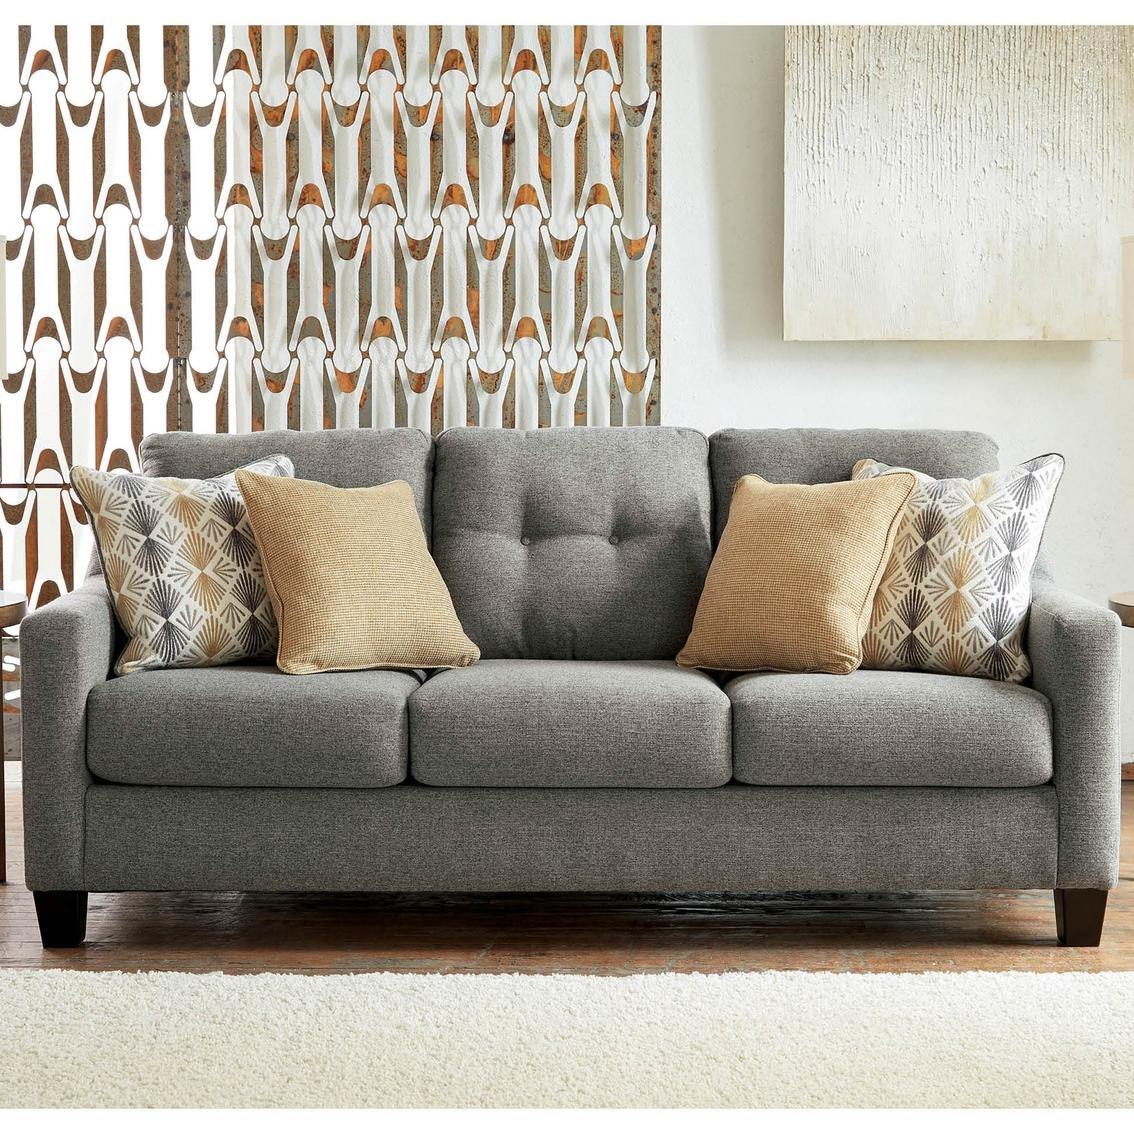 Benchcraft Daylon Sofa Sofas Couches Home Appliances Shop